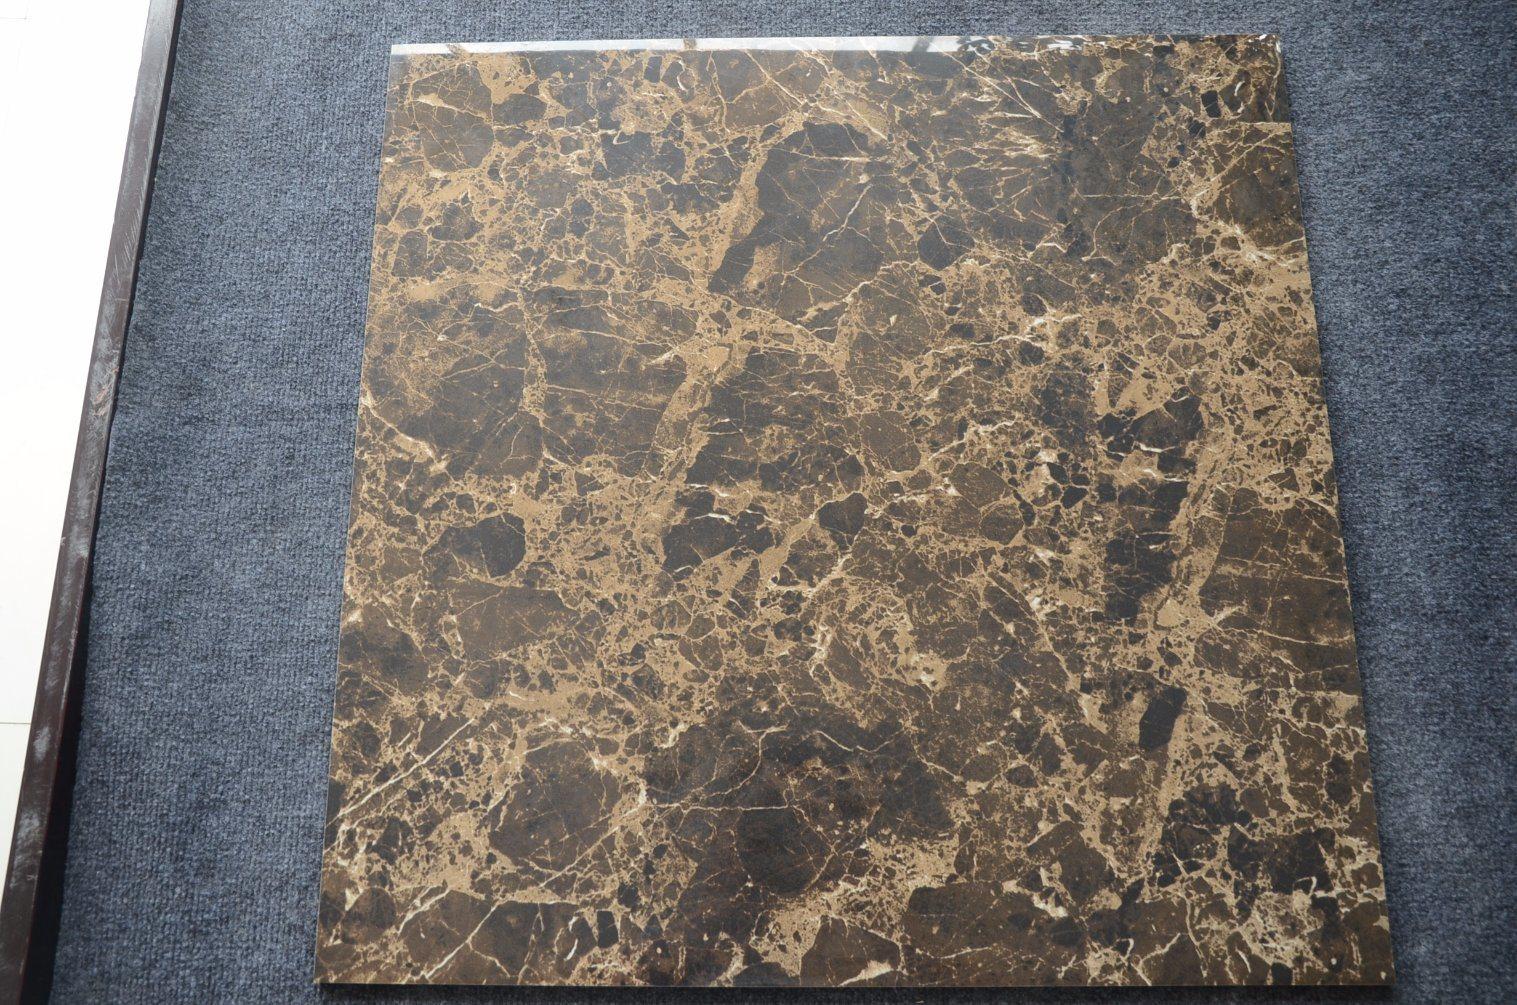 China HS630gn Chinese Tile/Ceramic Tile Importer in Jeddah/Glazed ...